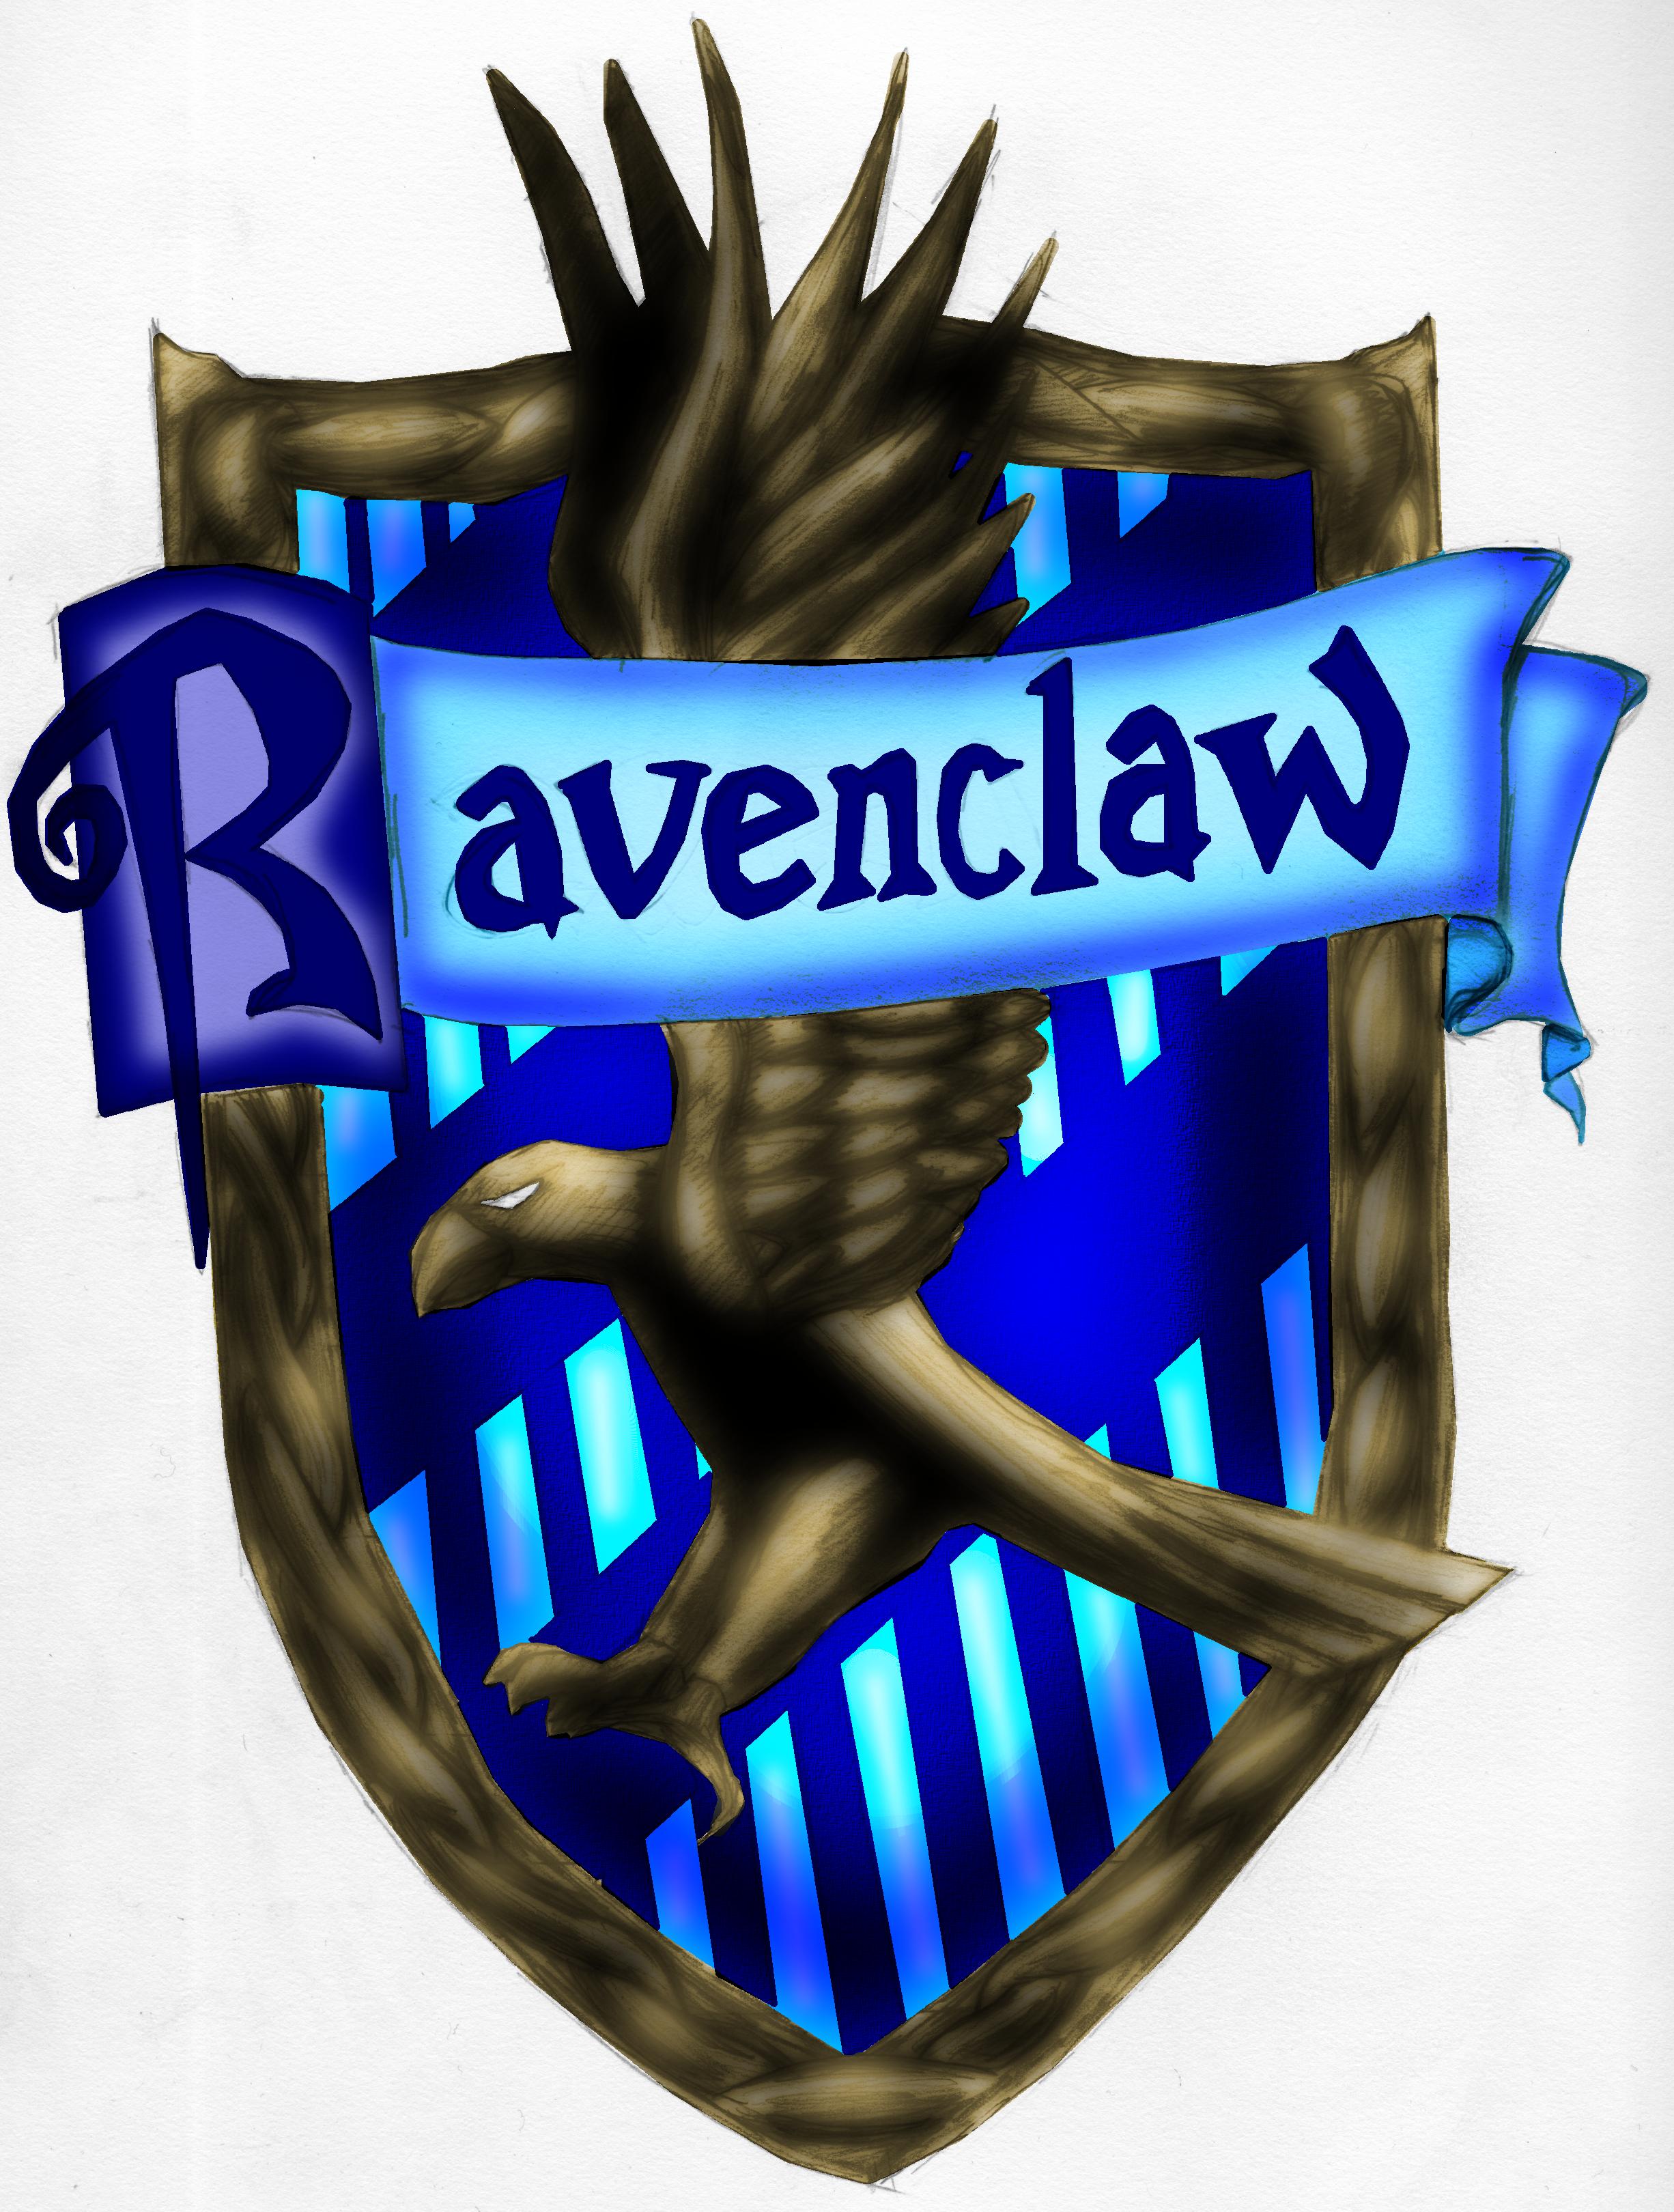 Ravenclaw favourites by lilmissblcksunshine on DeviantArt